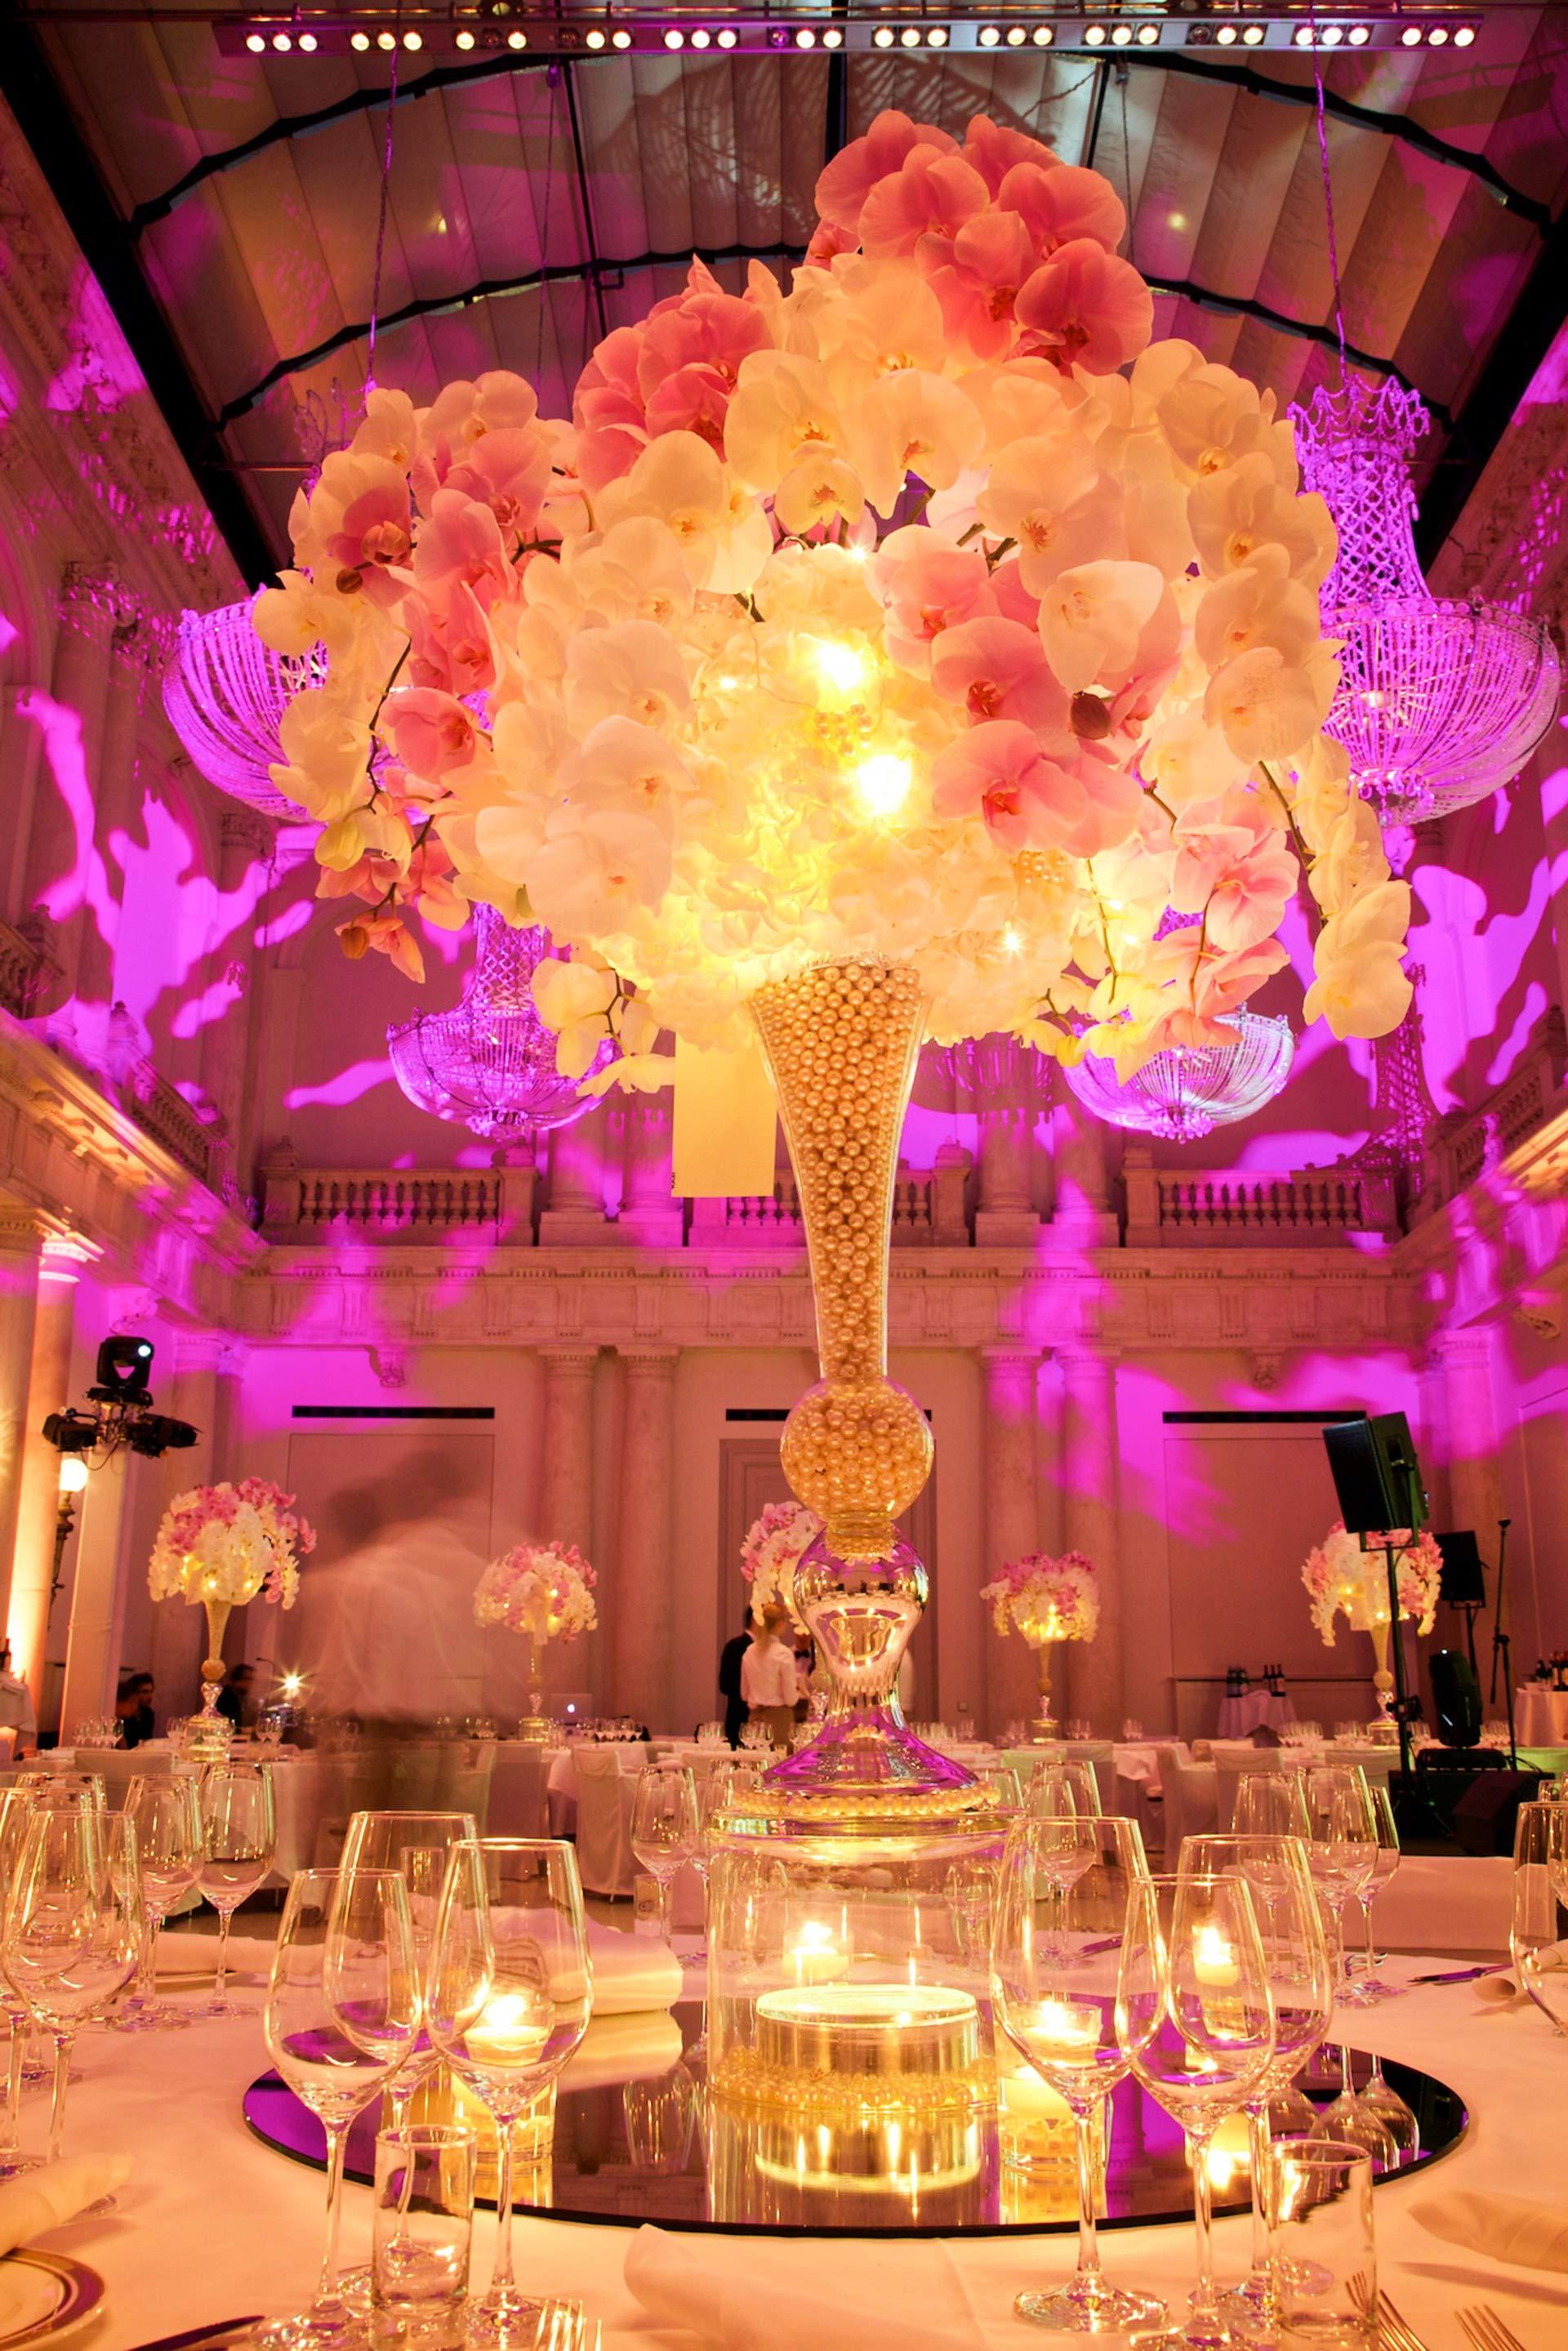 anina deko 3 hochzeitsfotograf berlin h2n wedding. Black Bedroom Furniture Sets. Home Design Ideas